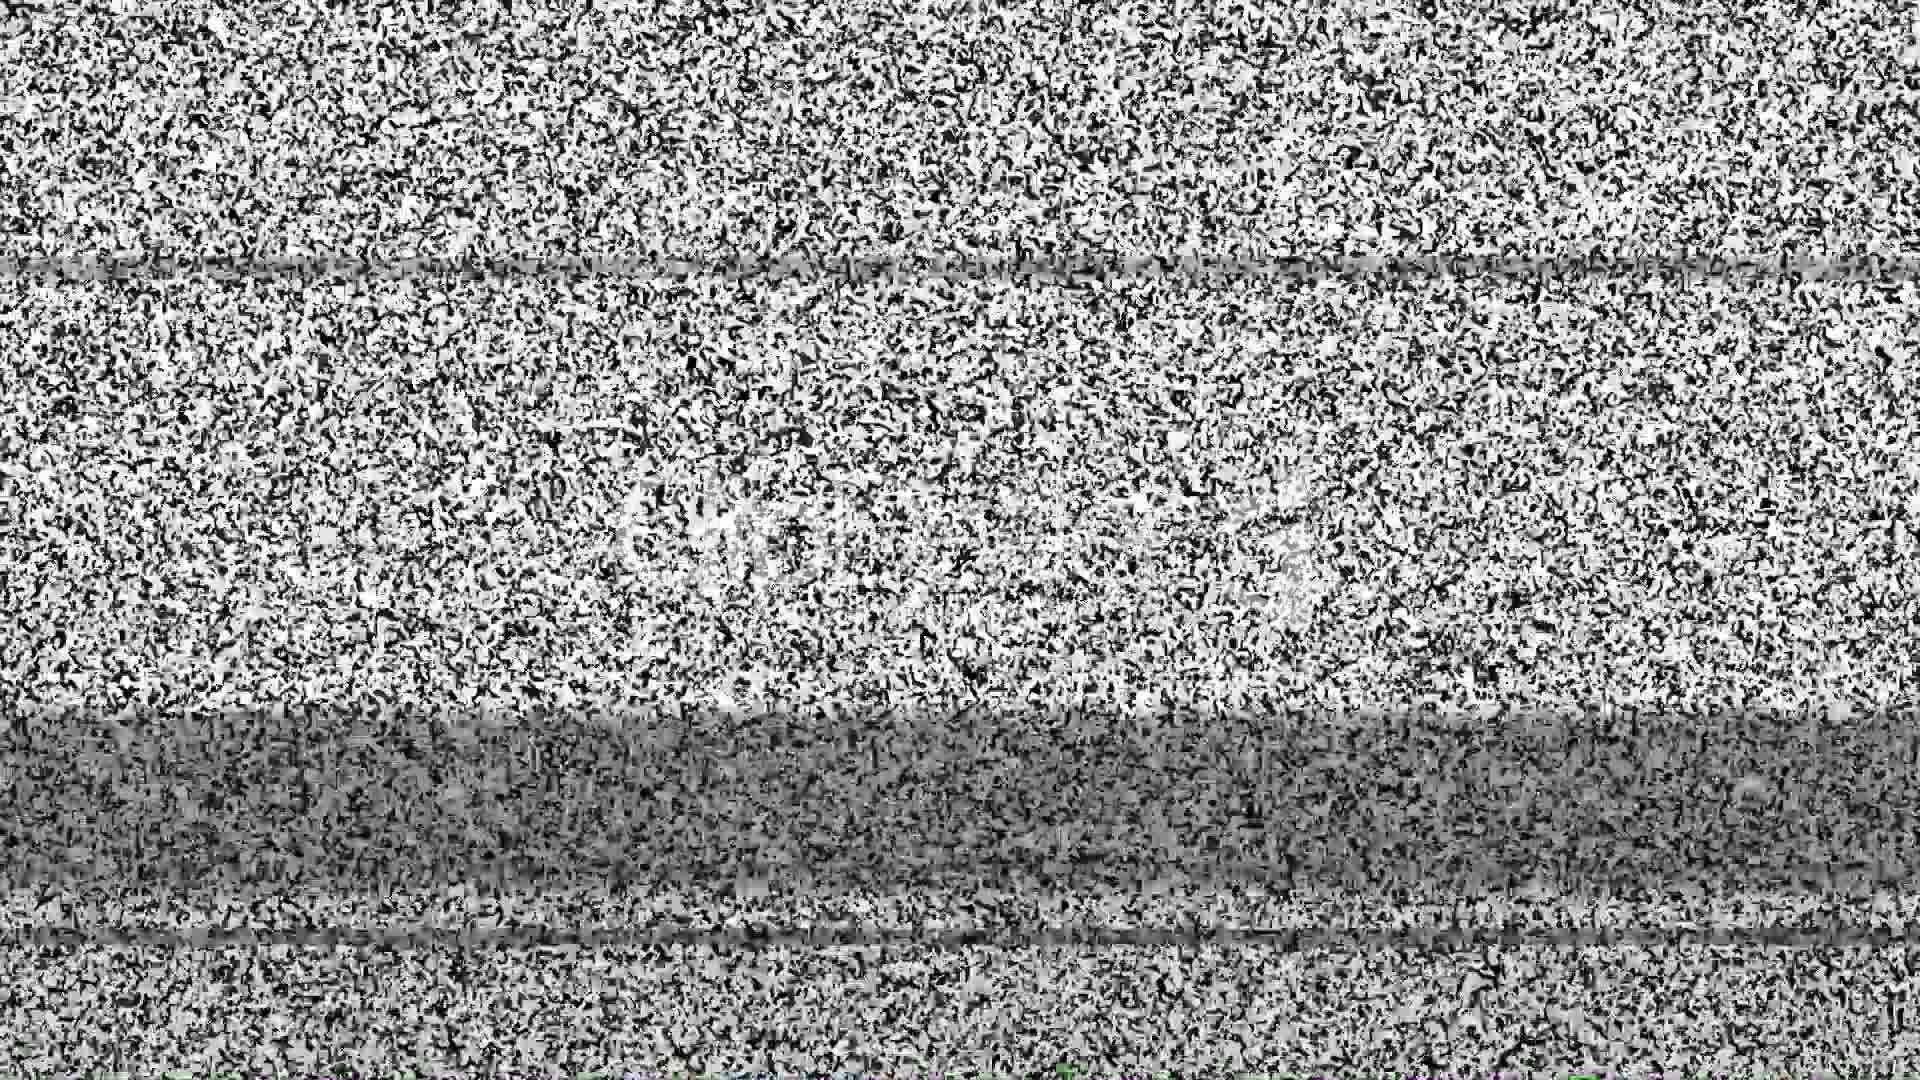 Tv Noise Texture Tv Static Photography Wallpaper Noise